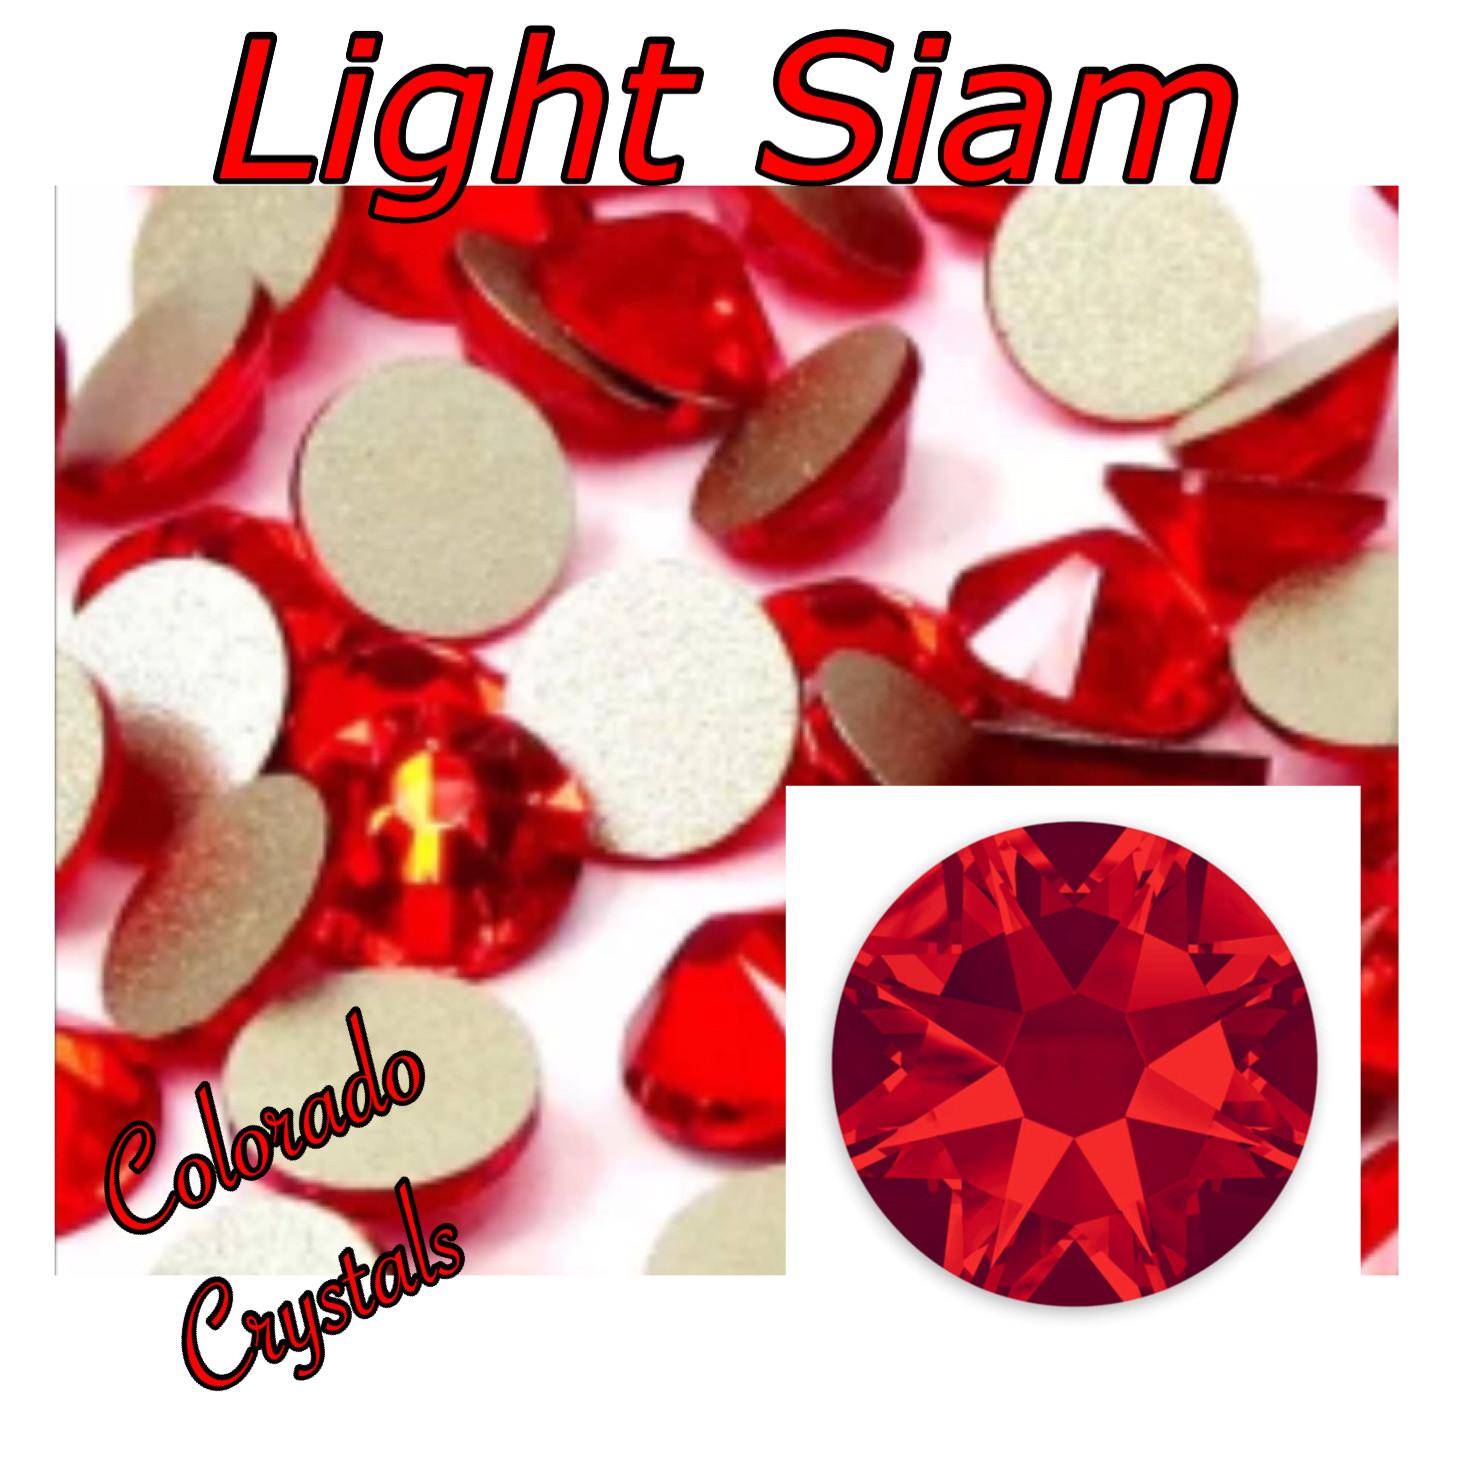 Light Siam 12ss 2088 Limited Swarovski Red Crystals